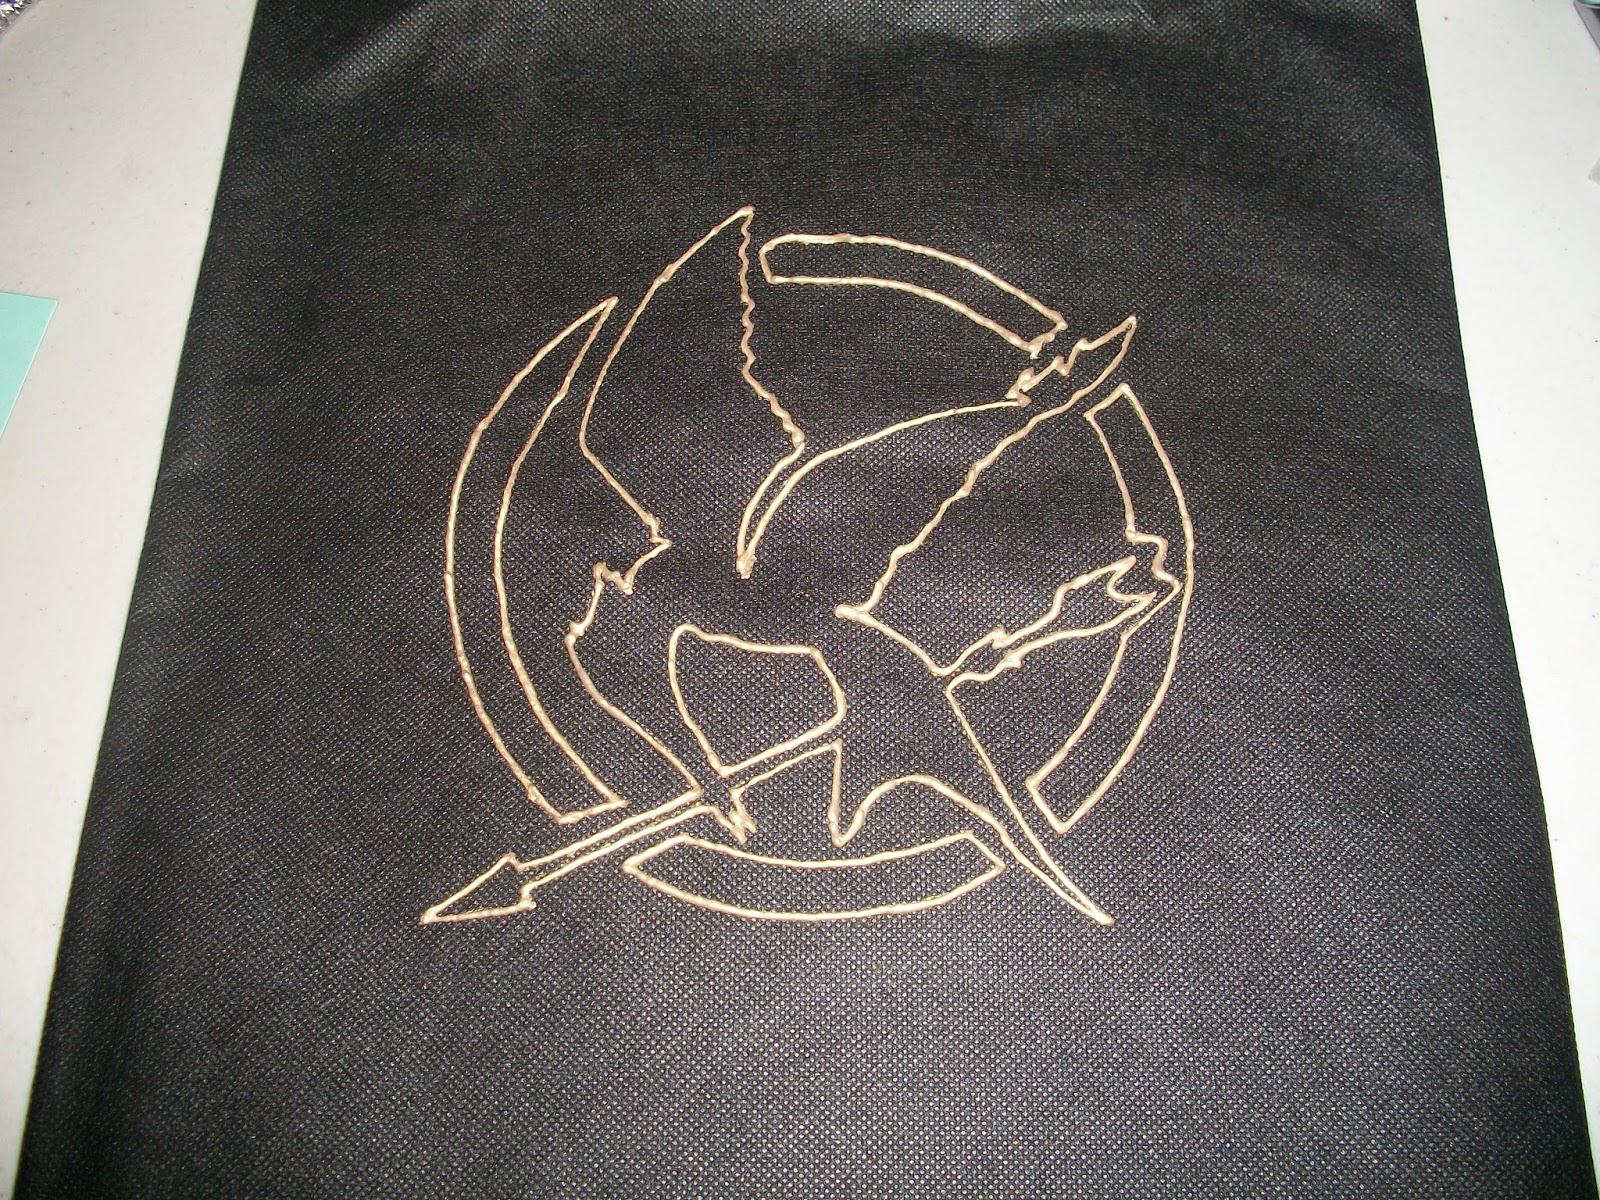 DIY: Mockingjay logo tote bags